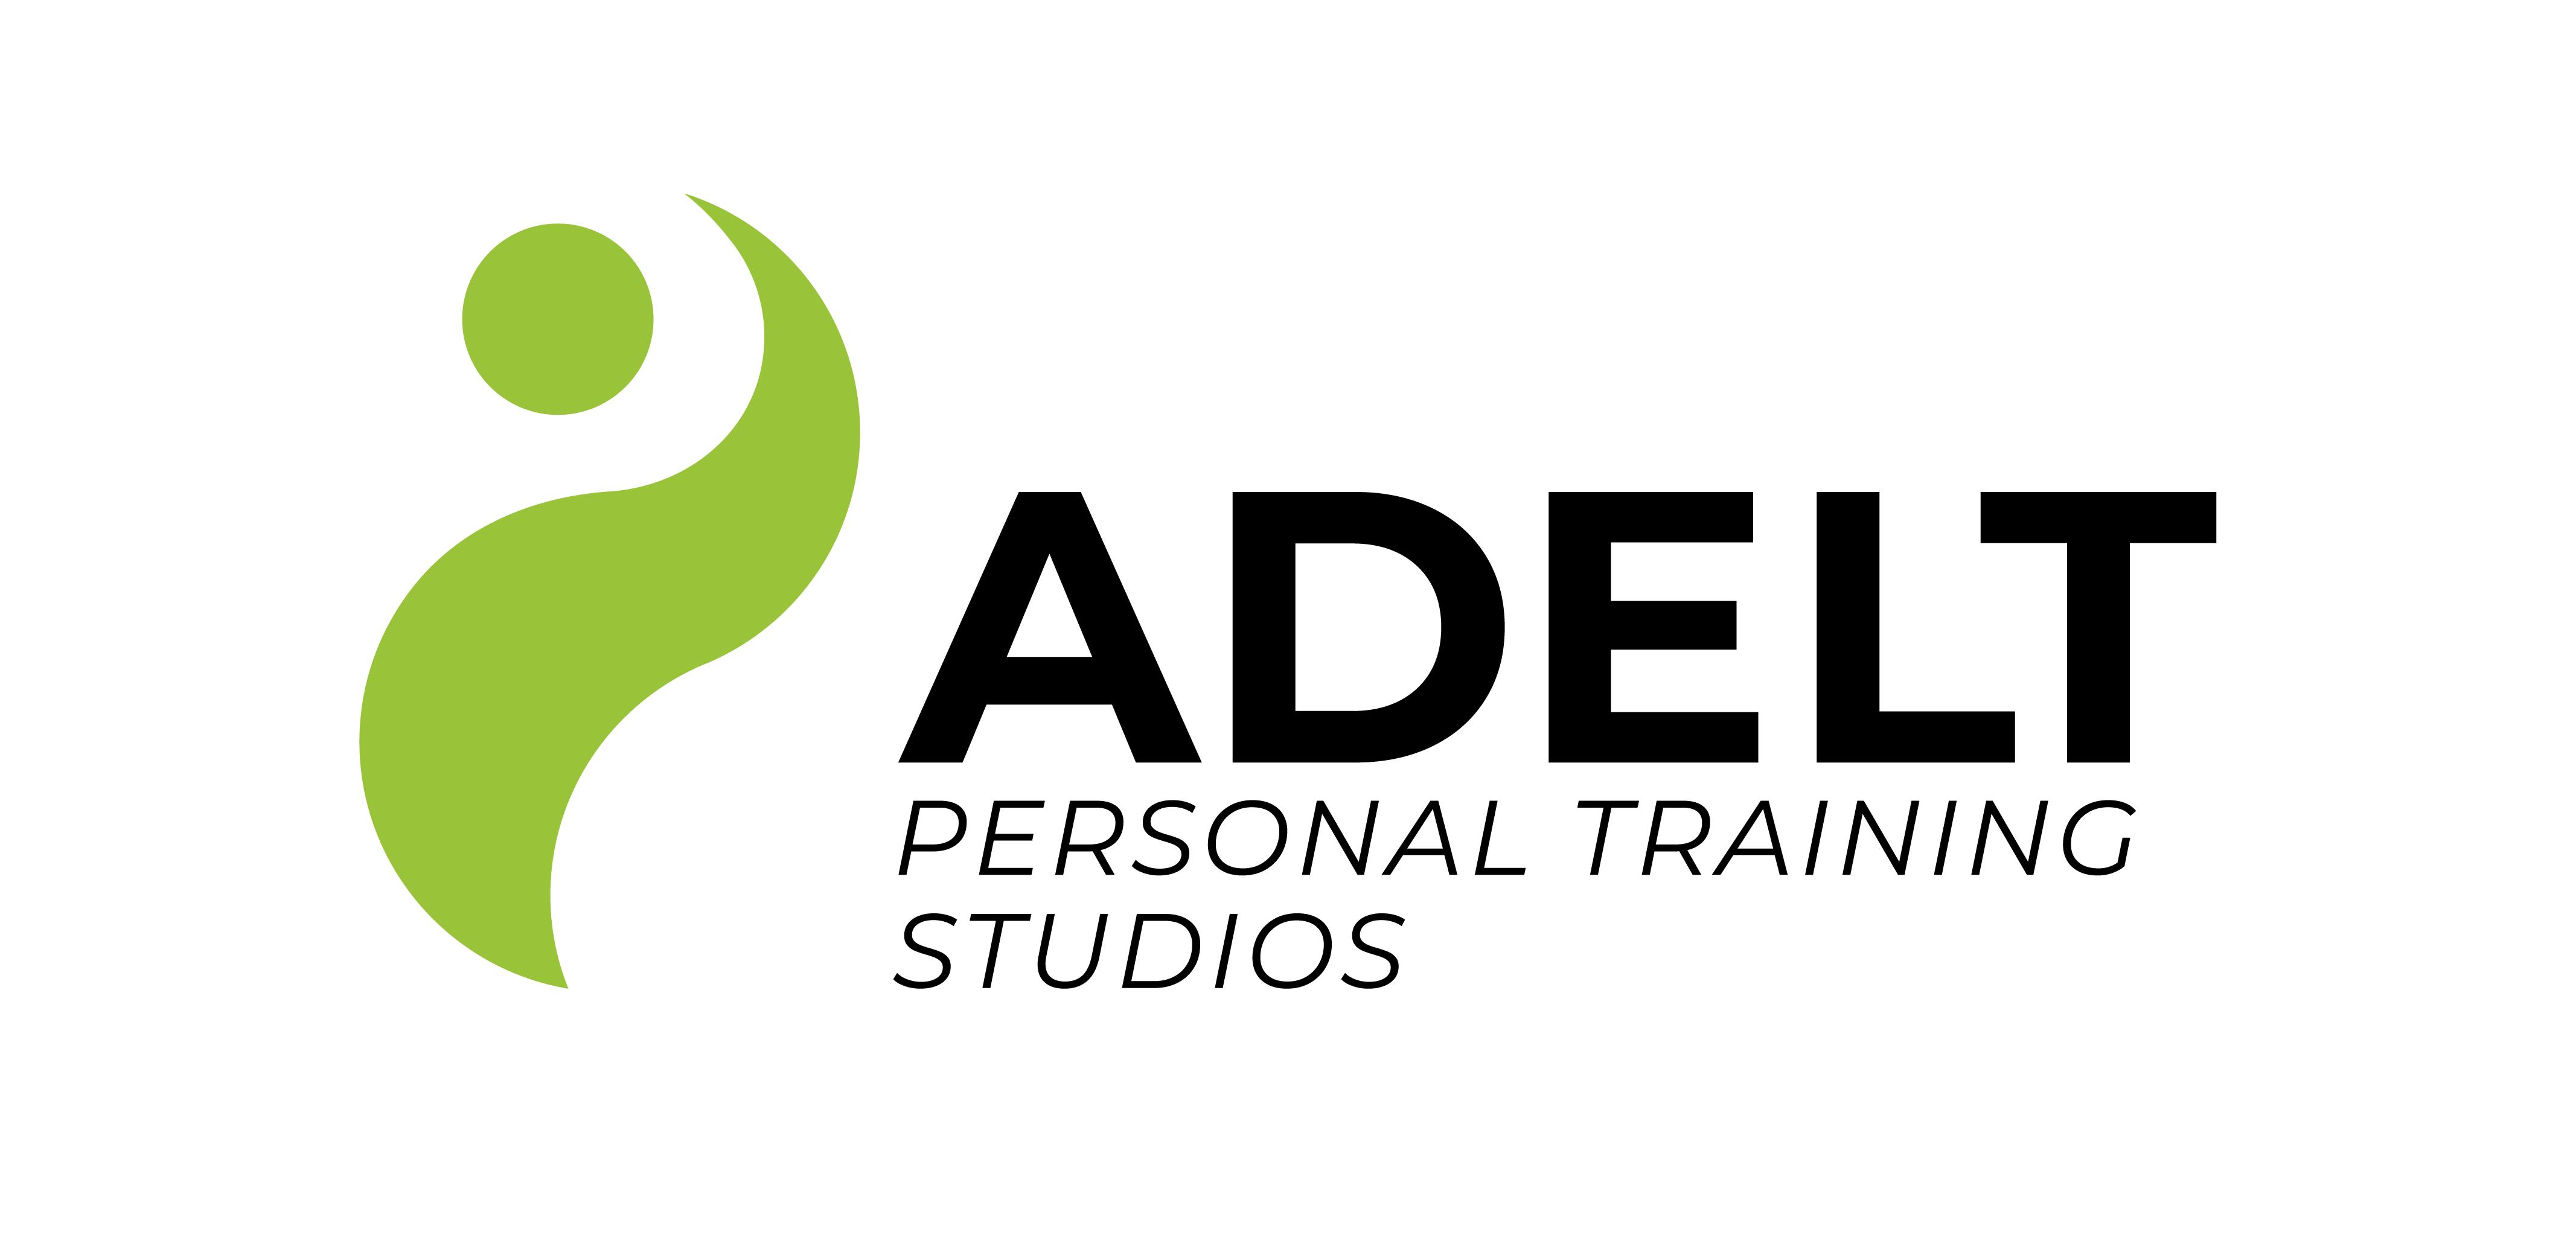 Adelt Personal Training Studios